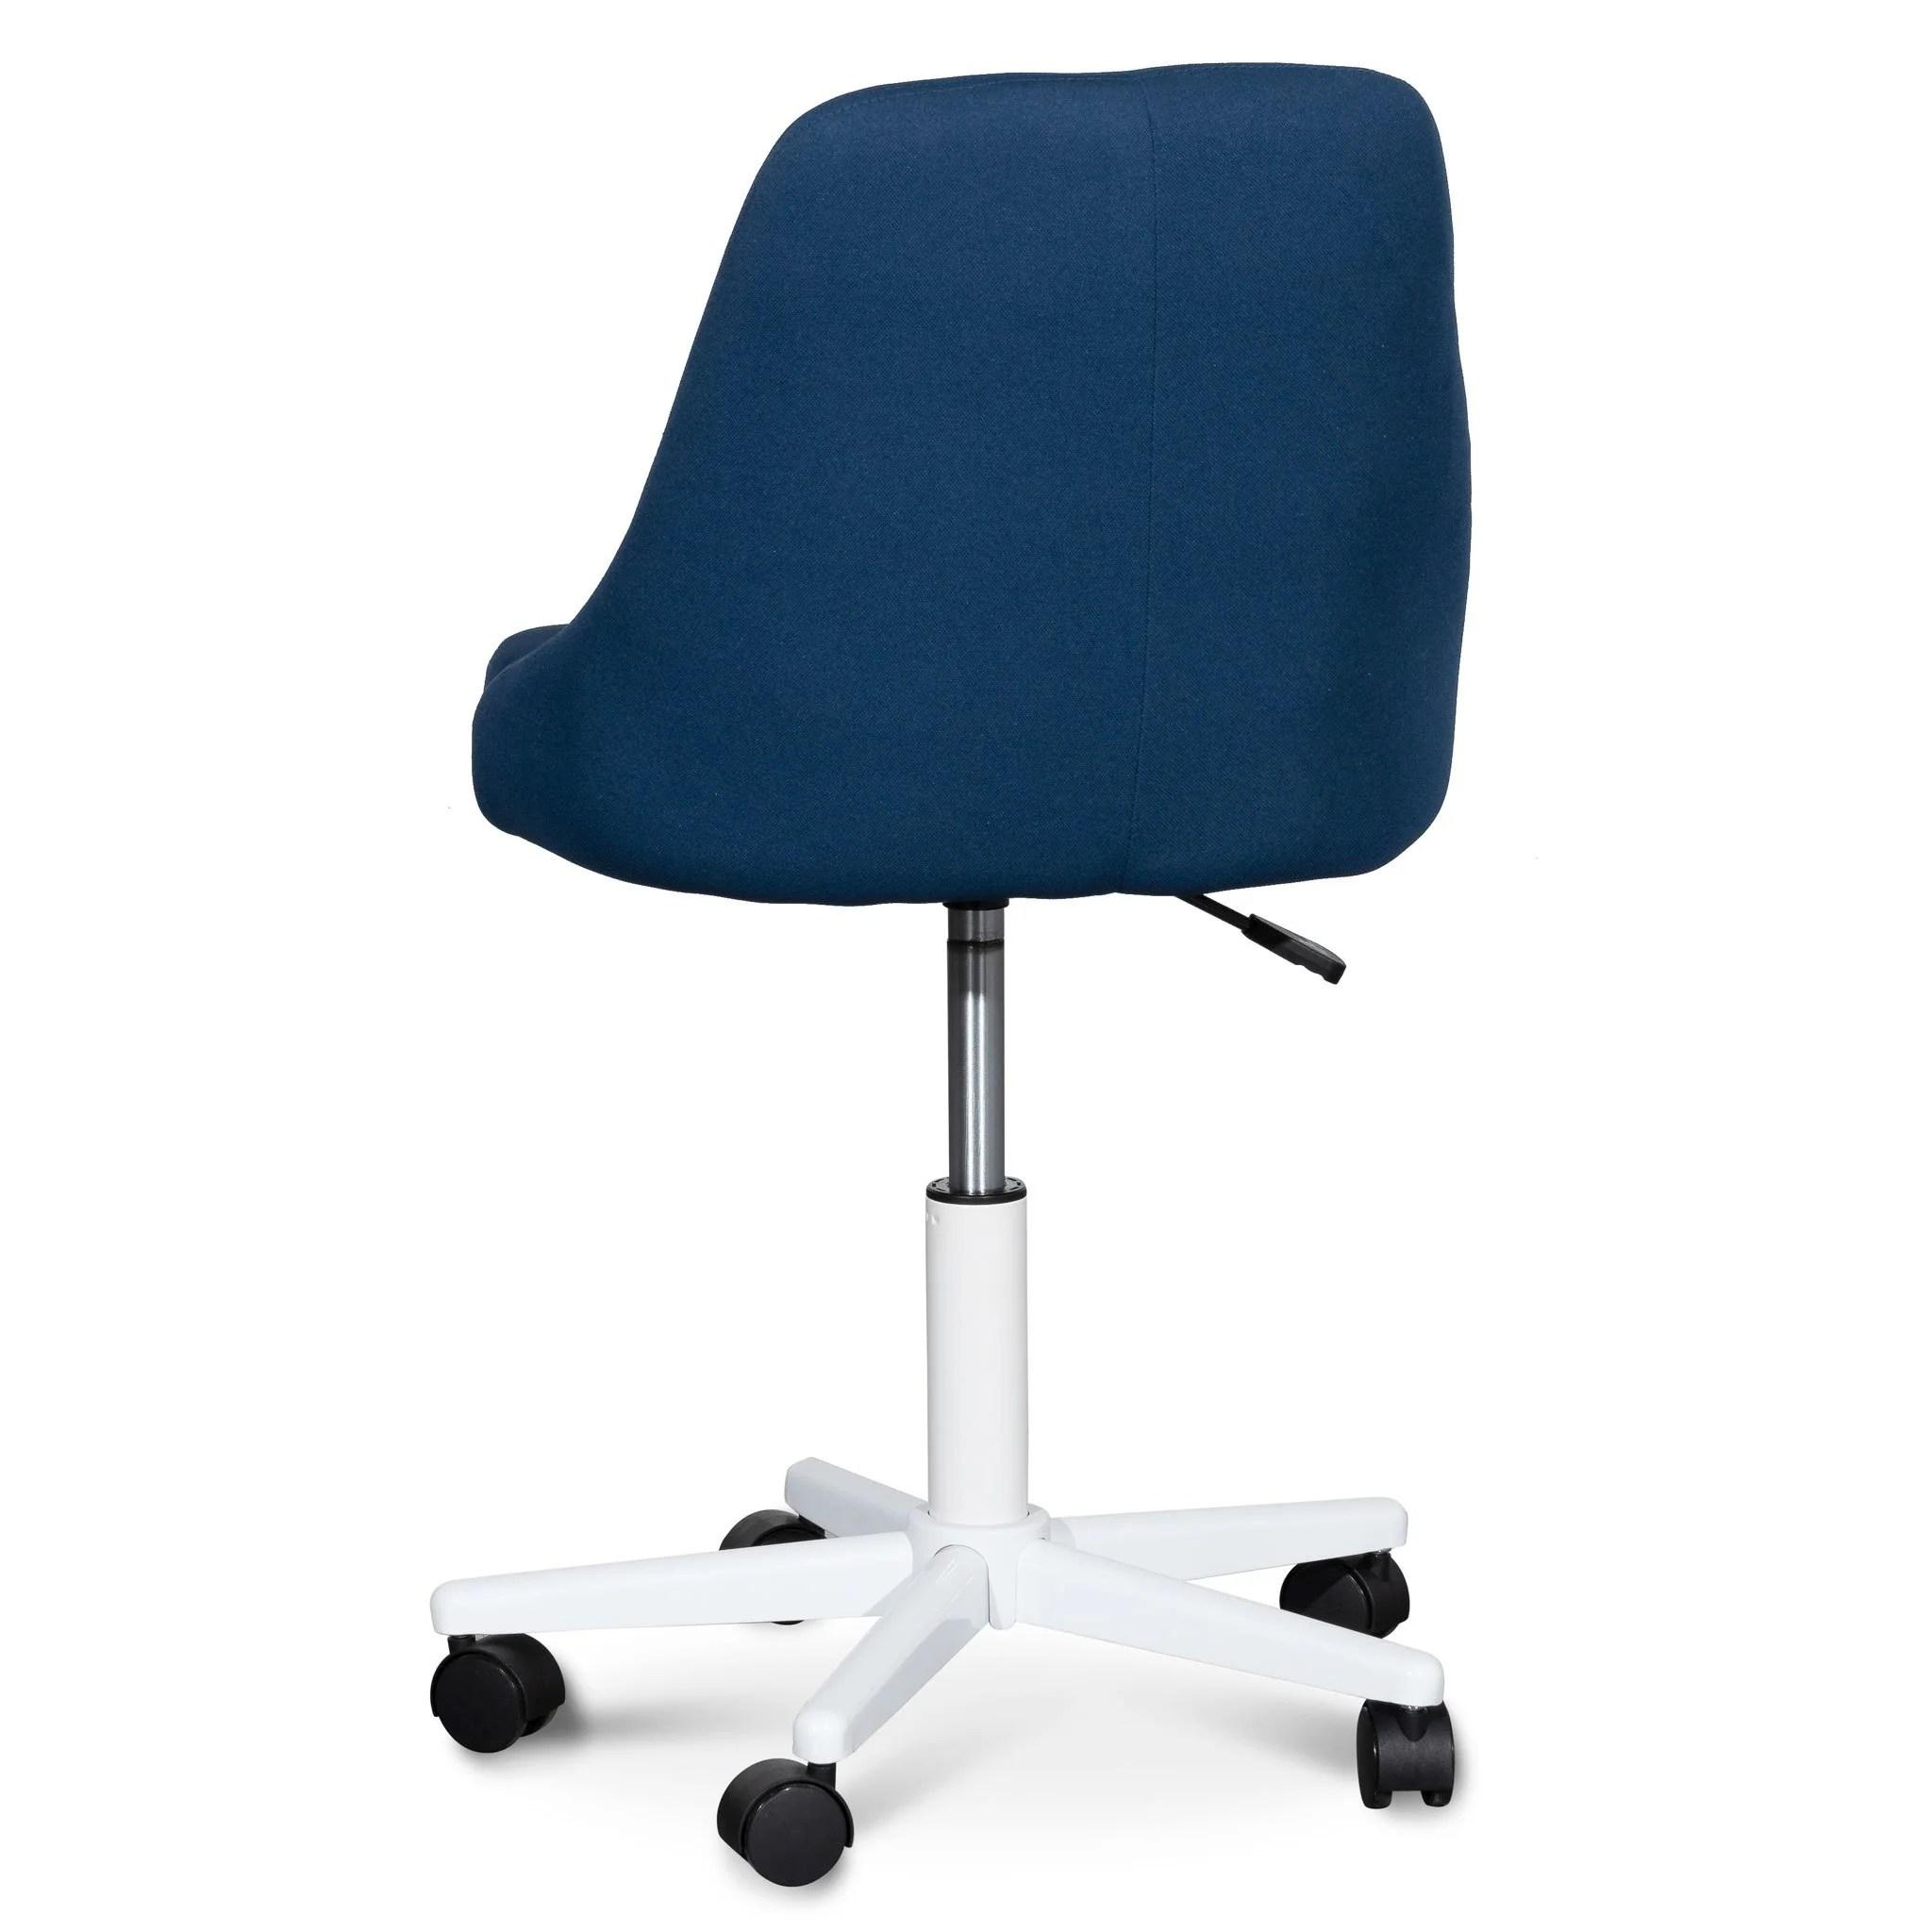 Ernesto Space Blue Fabric Office Chair White Base Interior Secrets